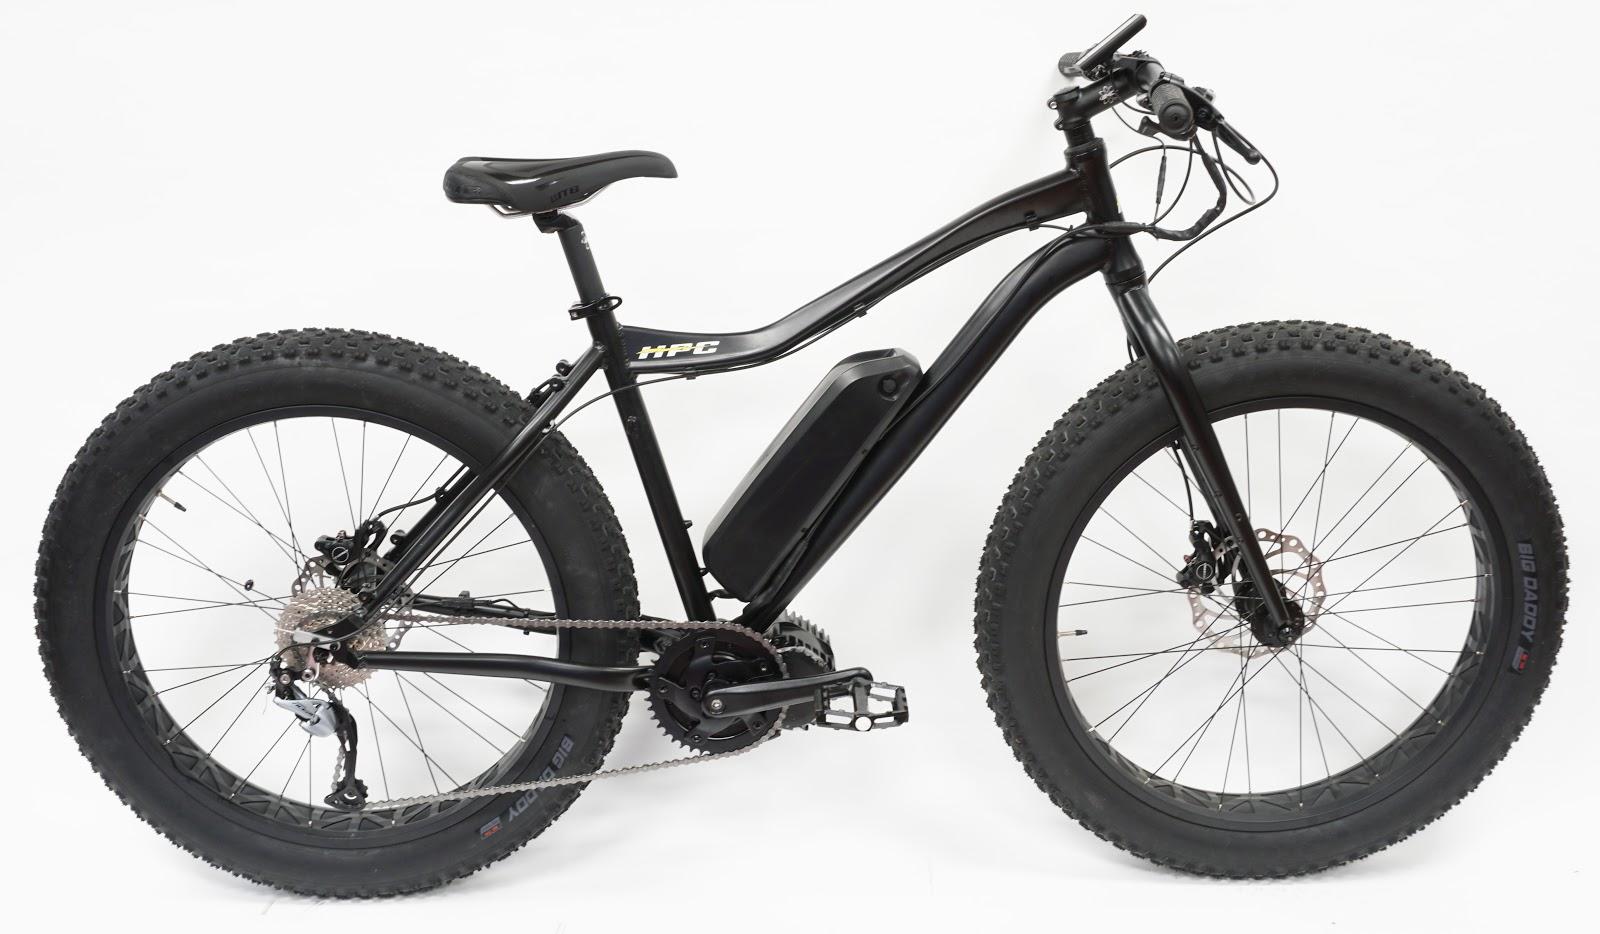 Crazy Fat E Bike Pricing Exposed